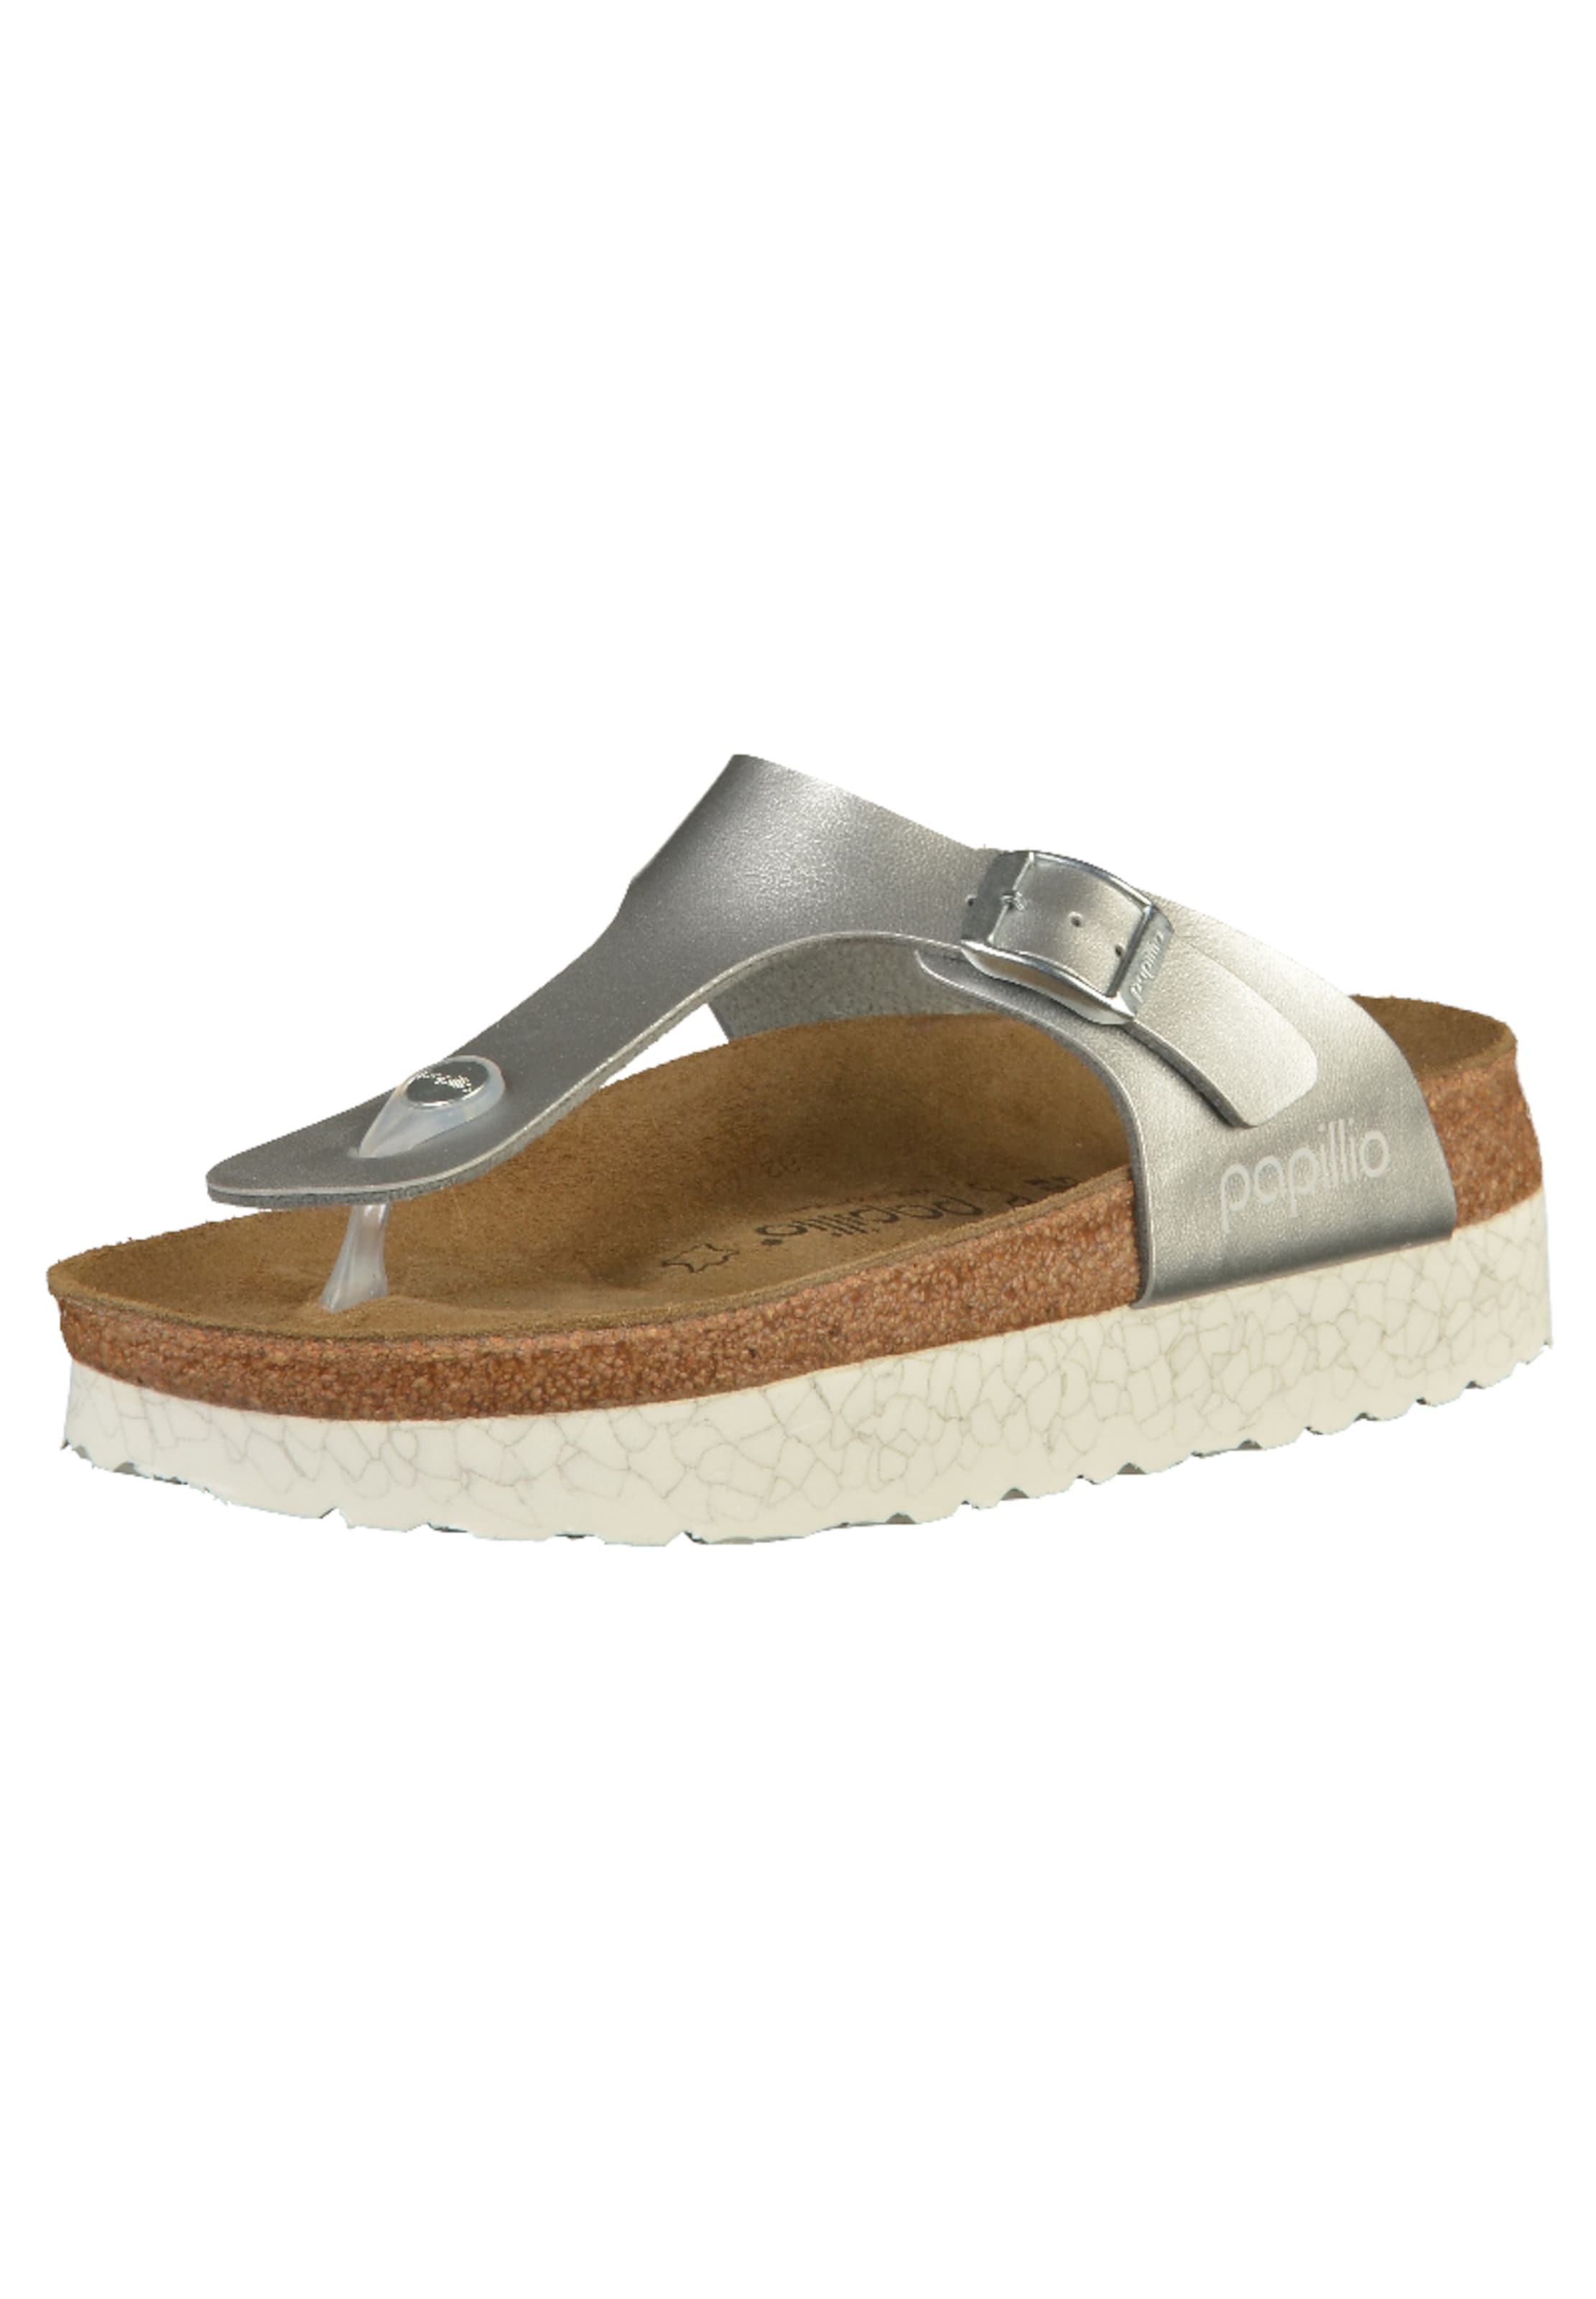 Haltbare Mode billige Schuhe PAPILLIO | Zehensteg 'Gizeh' Schuhe Gut getragene Schuhe